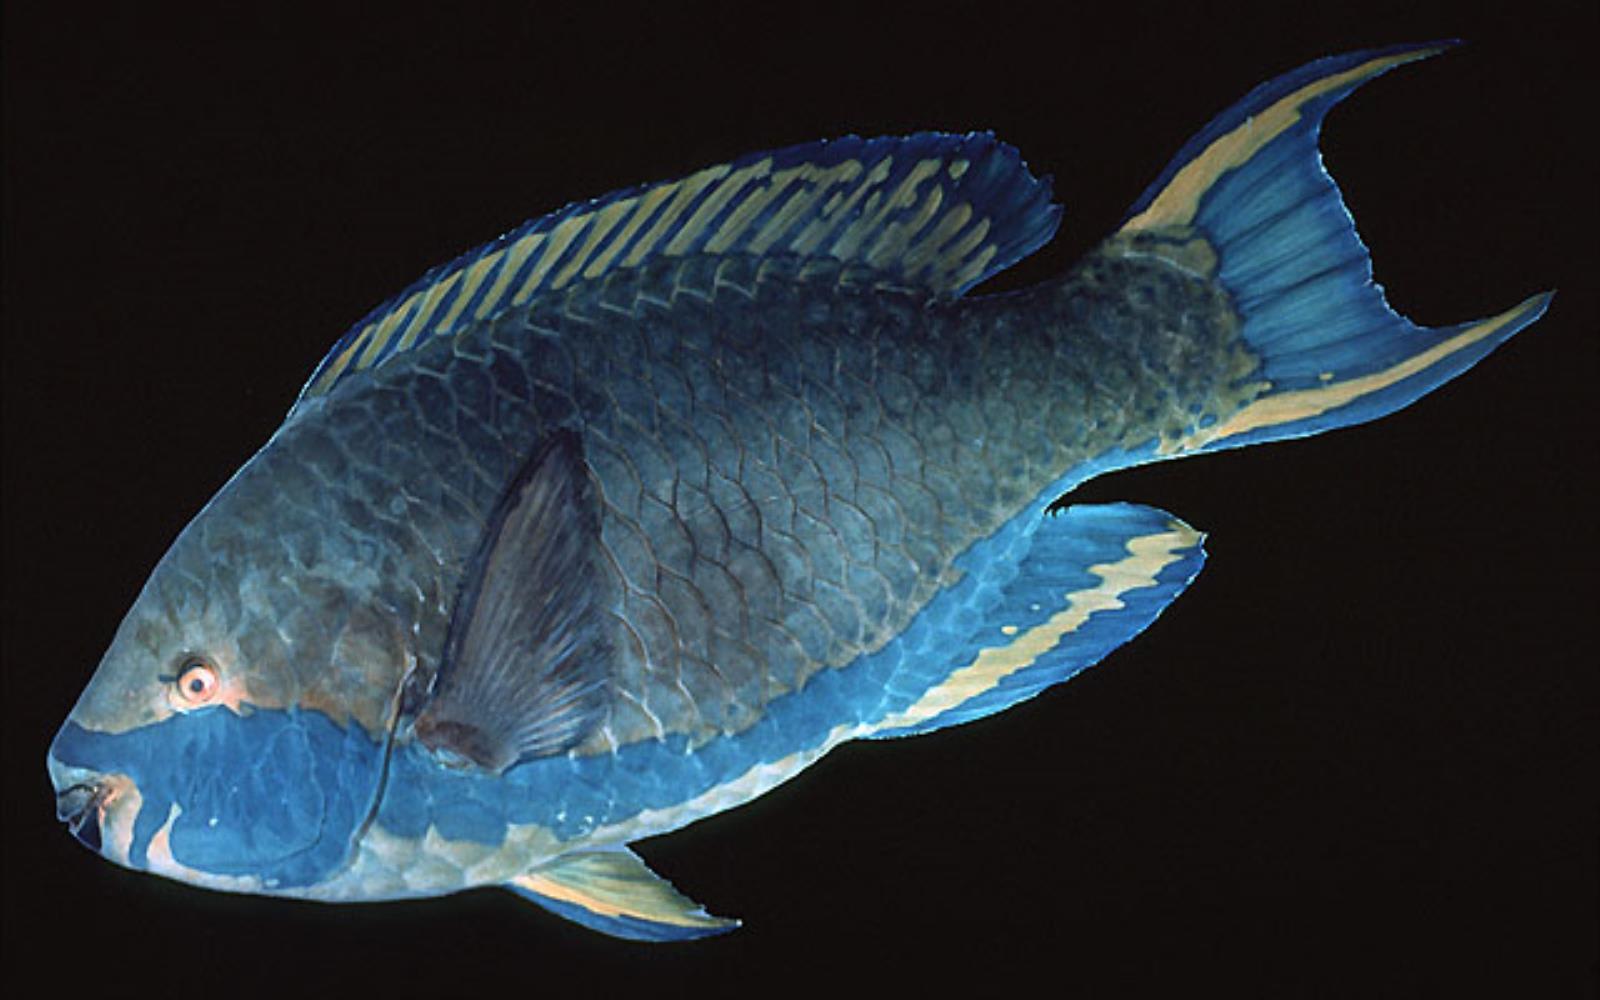 Sicklefin Parrotfish